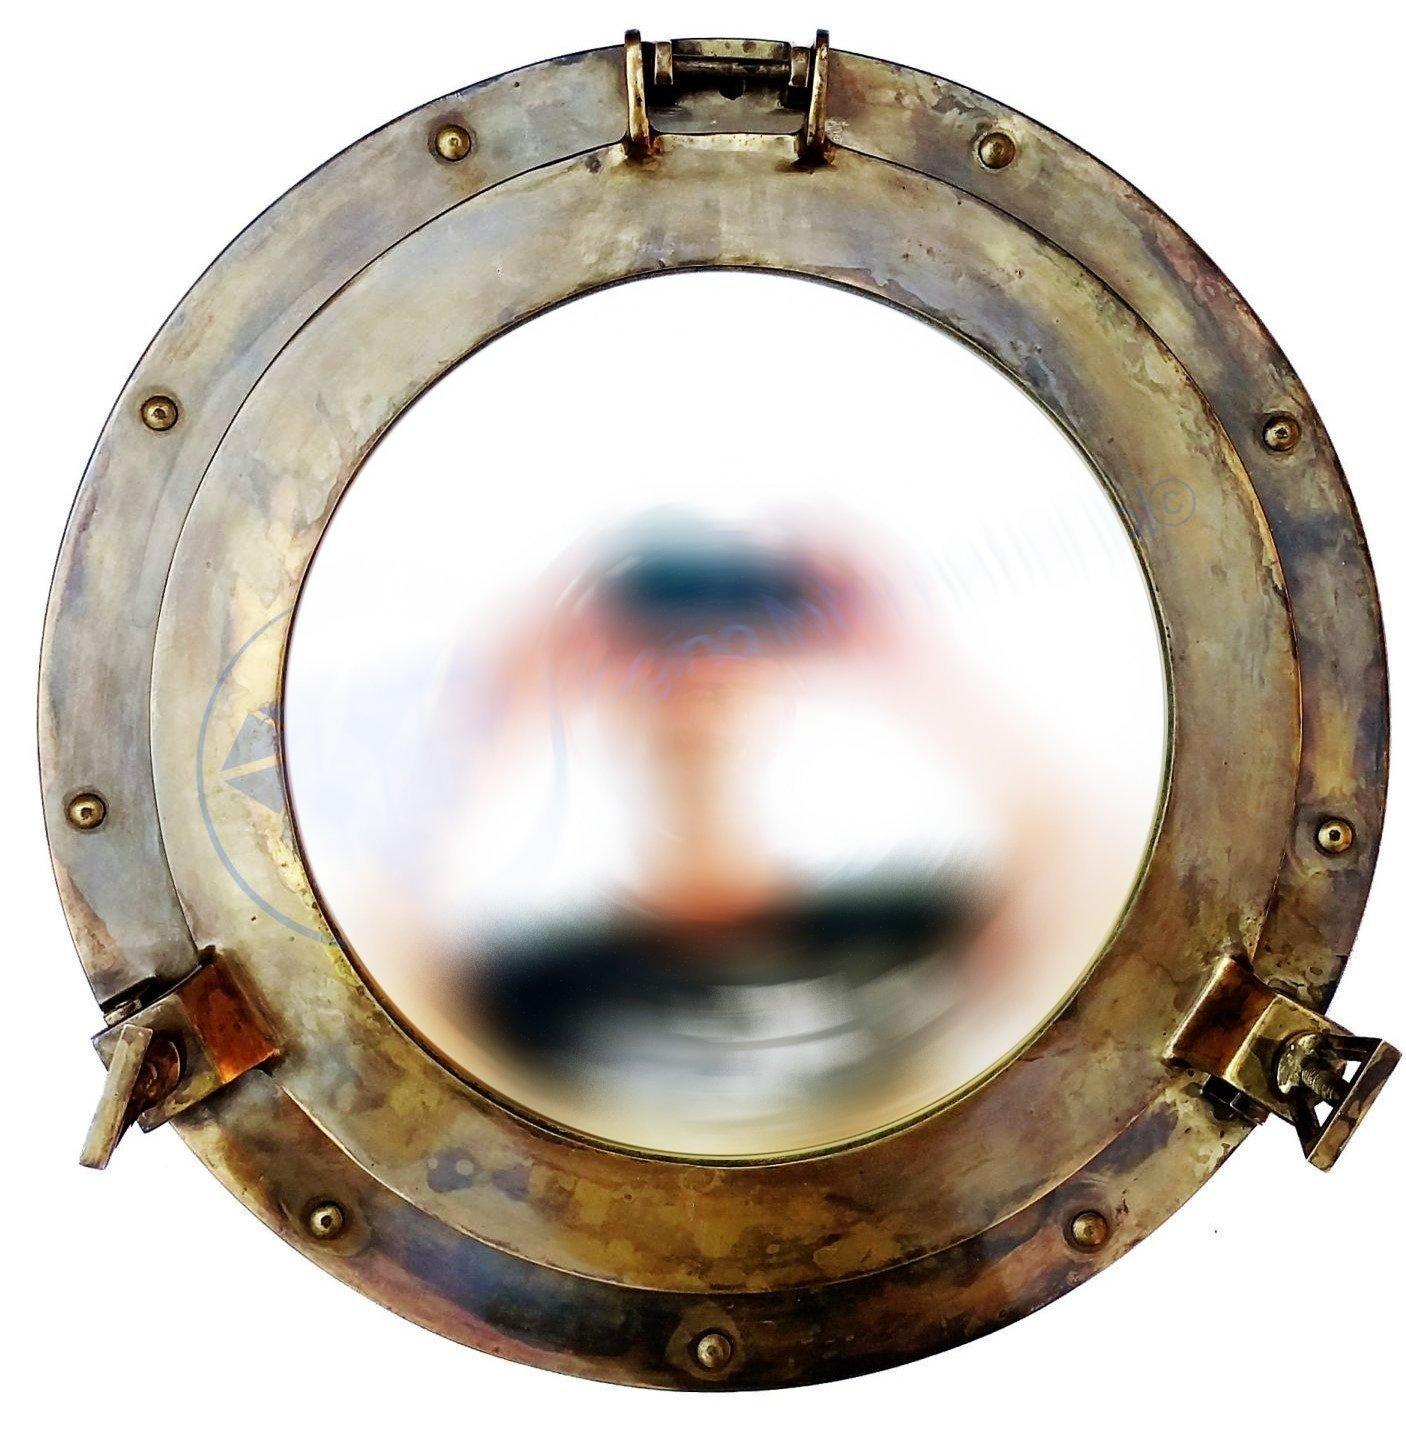 Nagina International Antique Brass Porthole Mirror | Maritime Ship's Decor | Wall Hanging (6 inches)